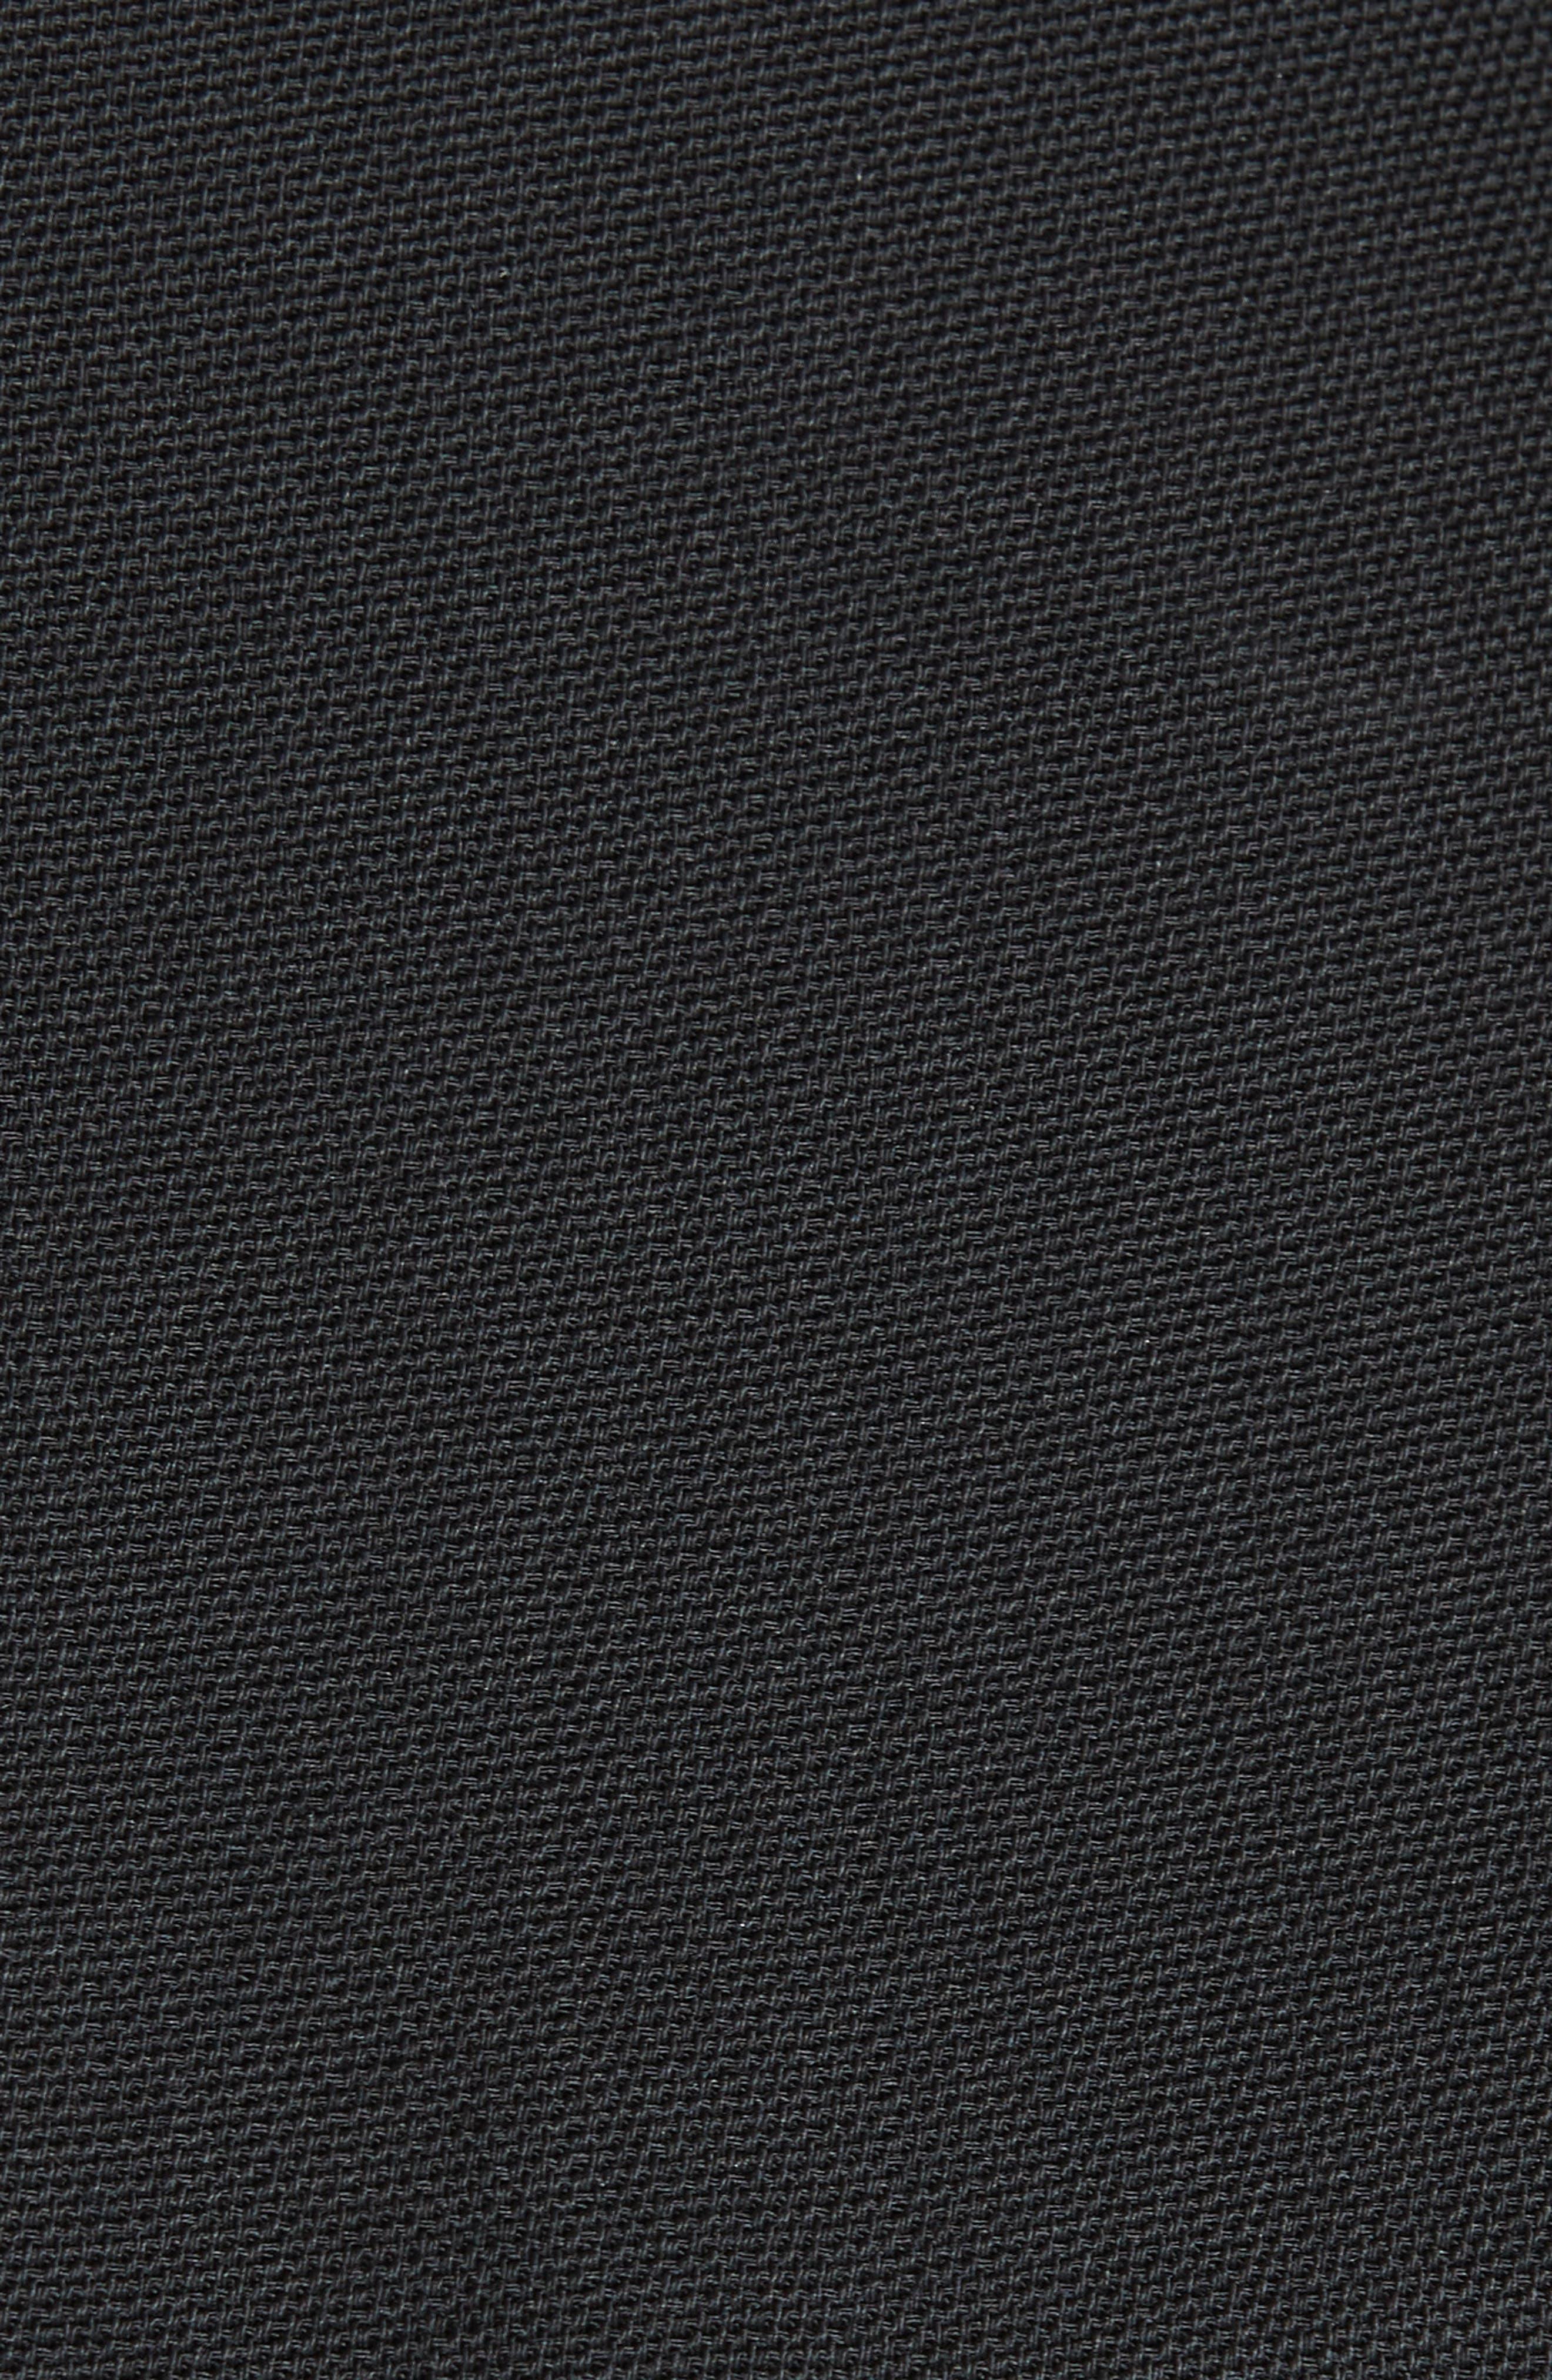 Carino High Waist Pants,                             Alternate thumbnail 5, color,                             001